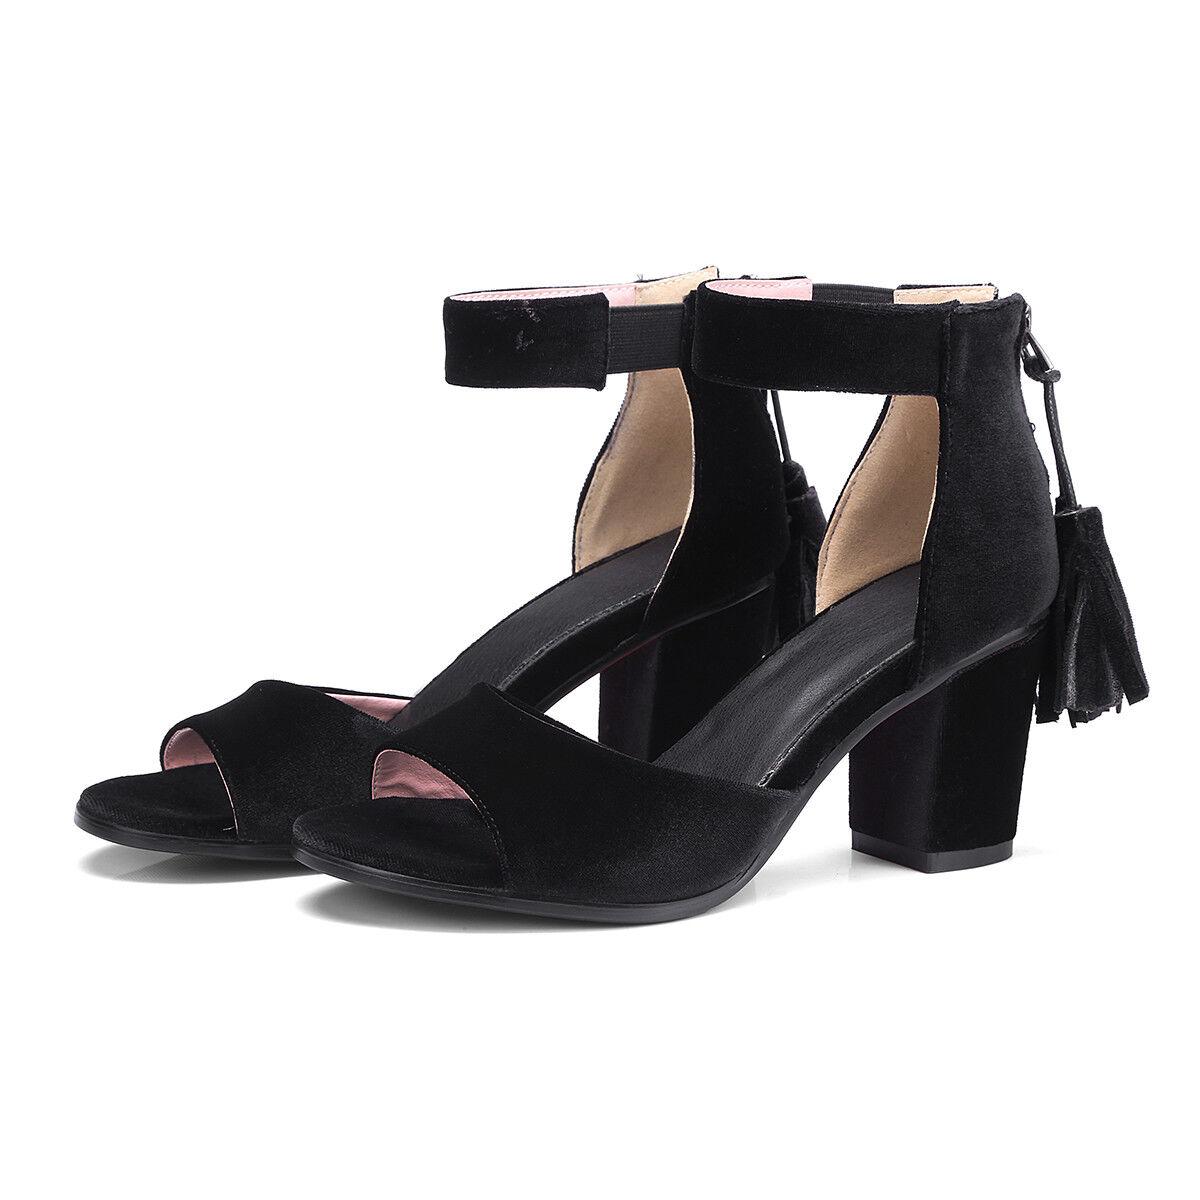 Mehrfarbig Damen Schuhe Sandalen Sommer Gr:33-43 Pumps Faux-wildleder High heels Gr:33-43 Sommer 8b115d